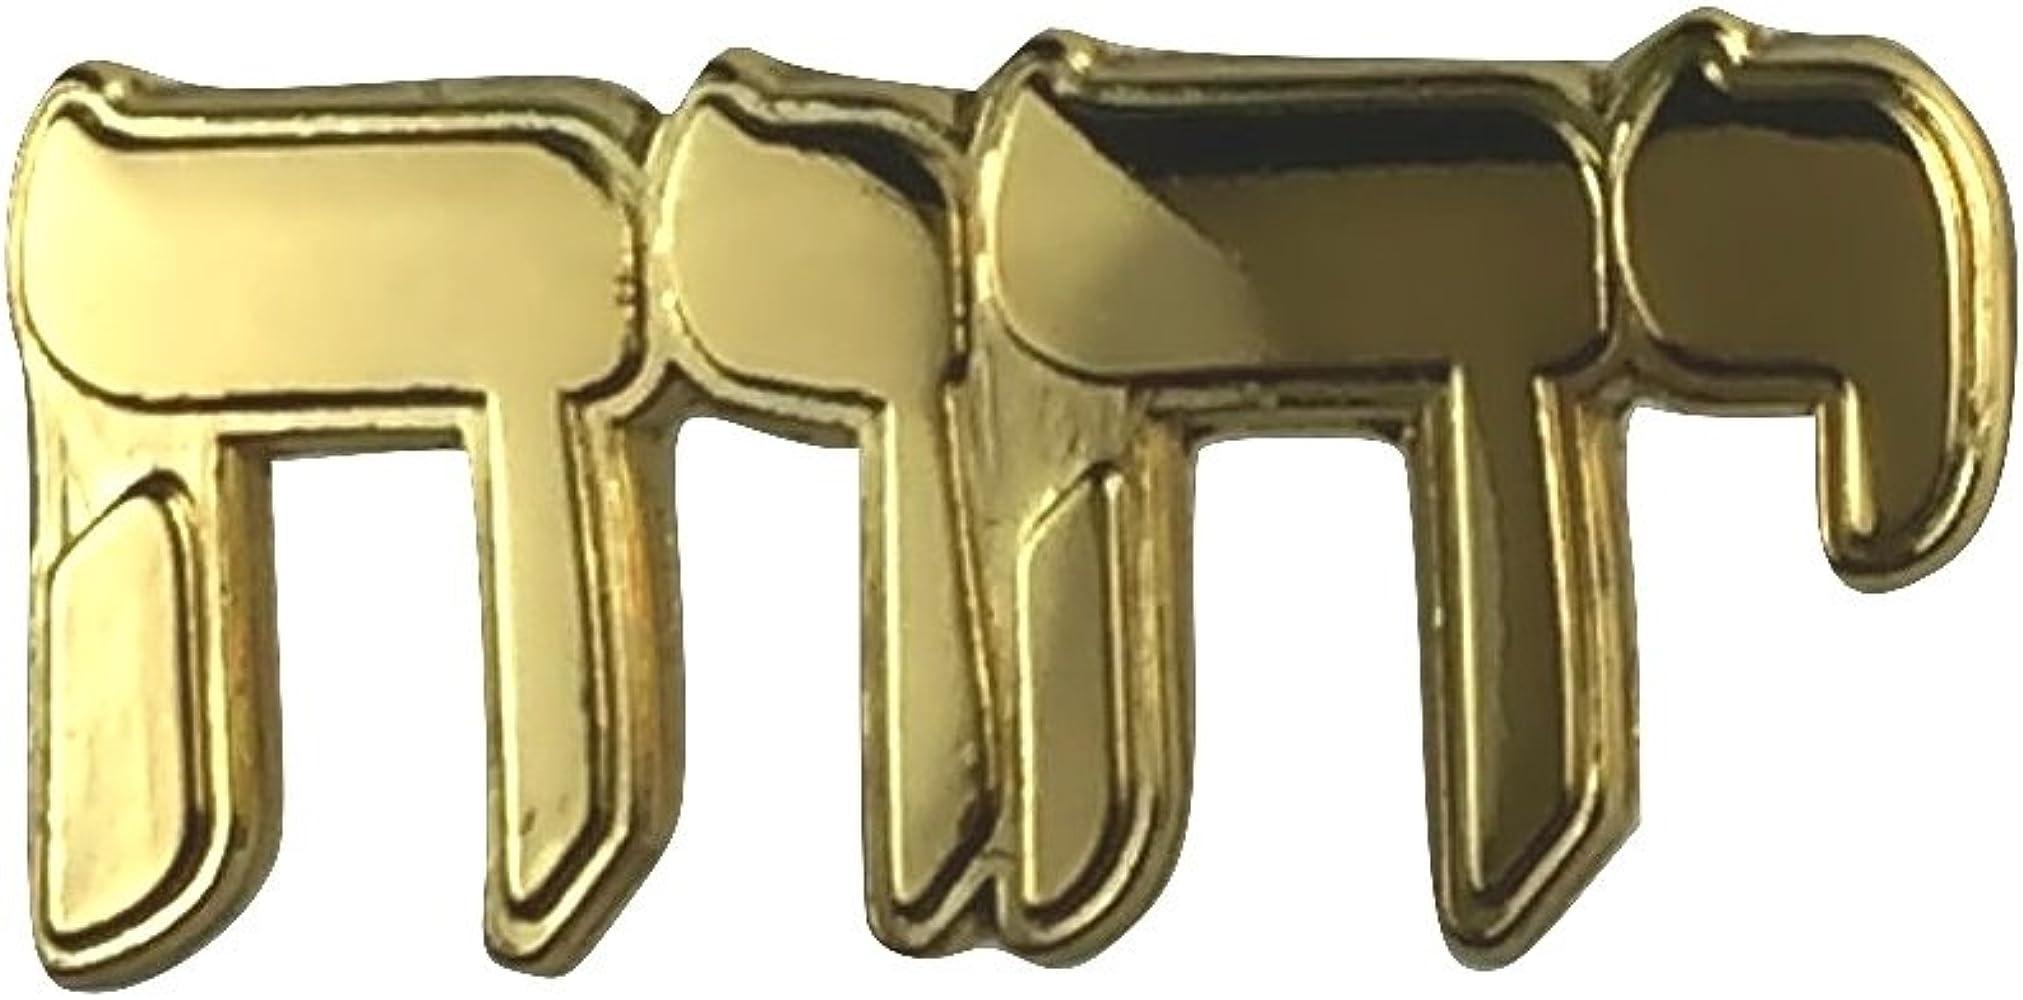 TETRAGRAMMATON Hebrew Letters Tie Tack Lapel Pin Golden